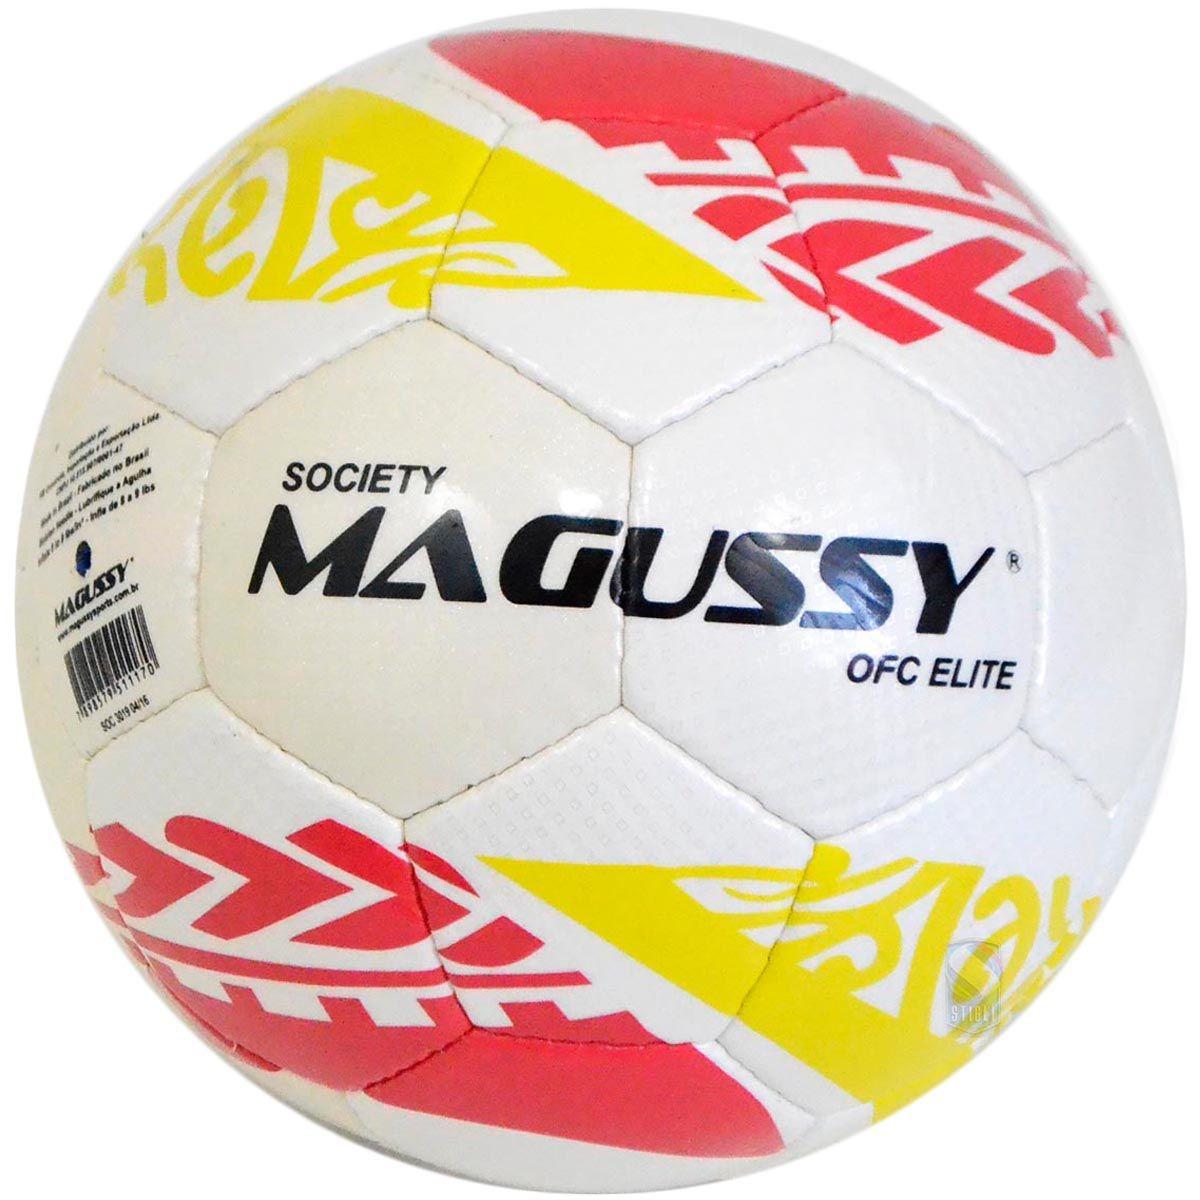 Bola De Futebol Society Magussy Microfibra Costura Mão C  Nf - R  75 ... 452d95c41b4ba